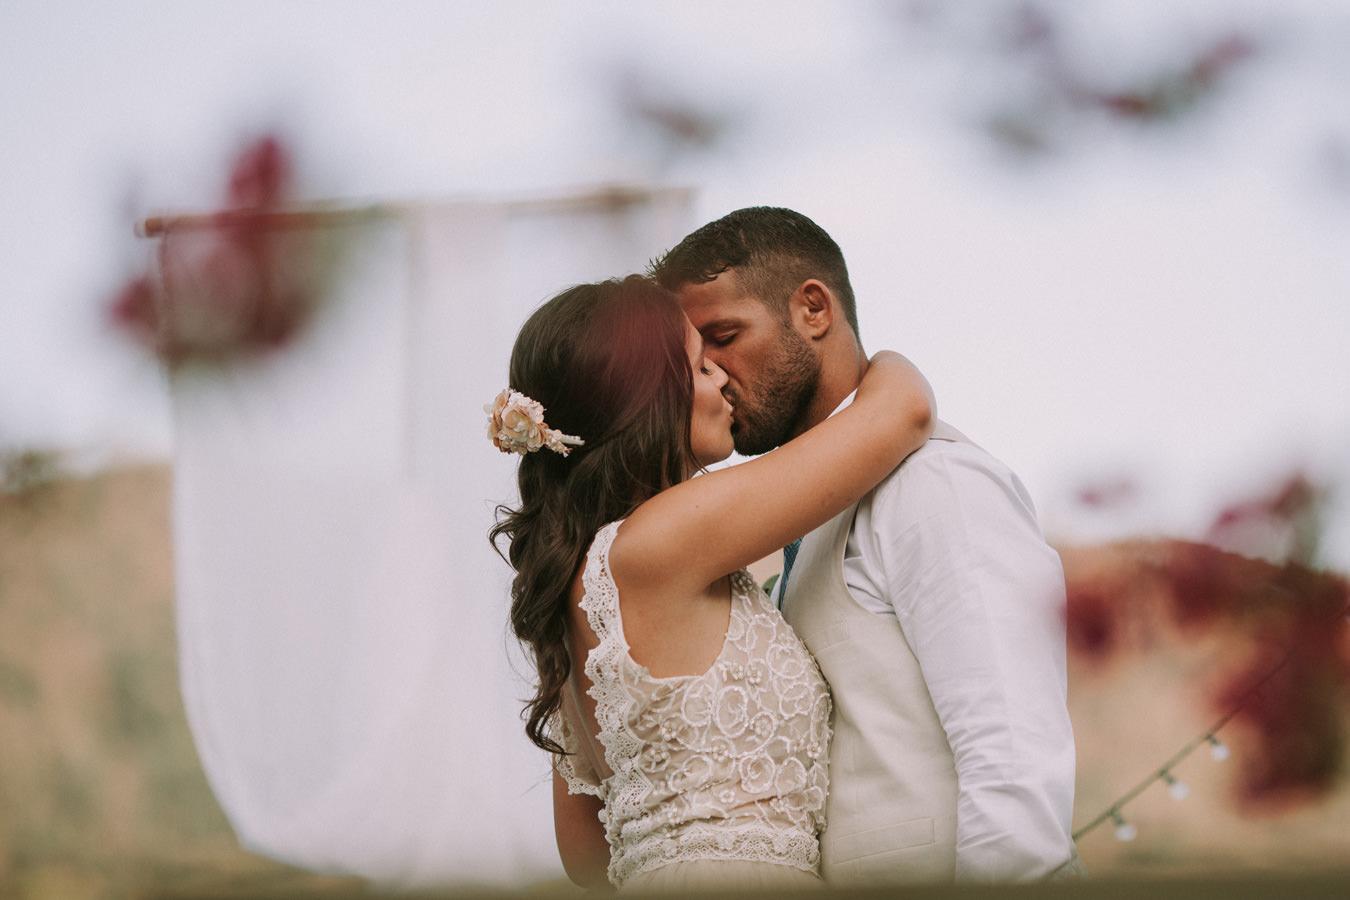 030-destinasjonsbryllup-bryllup-i-utlandet-tone-tvedt.jpg